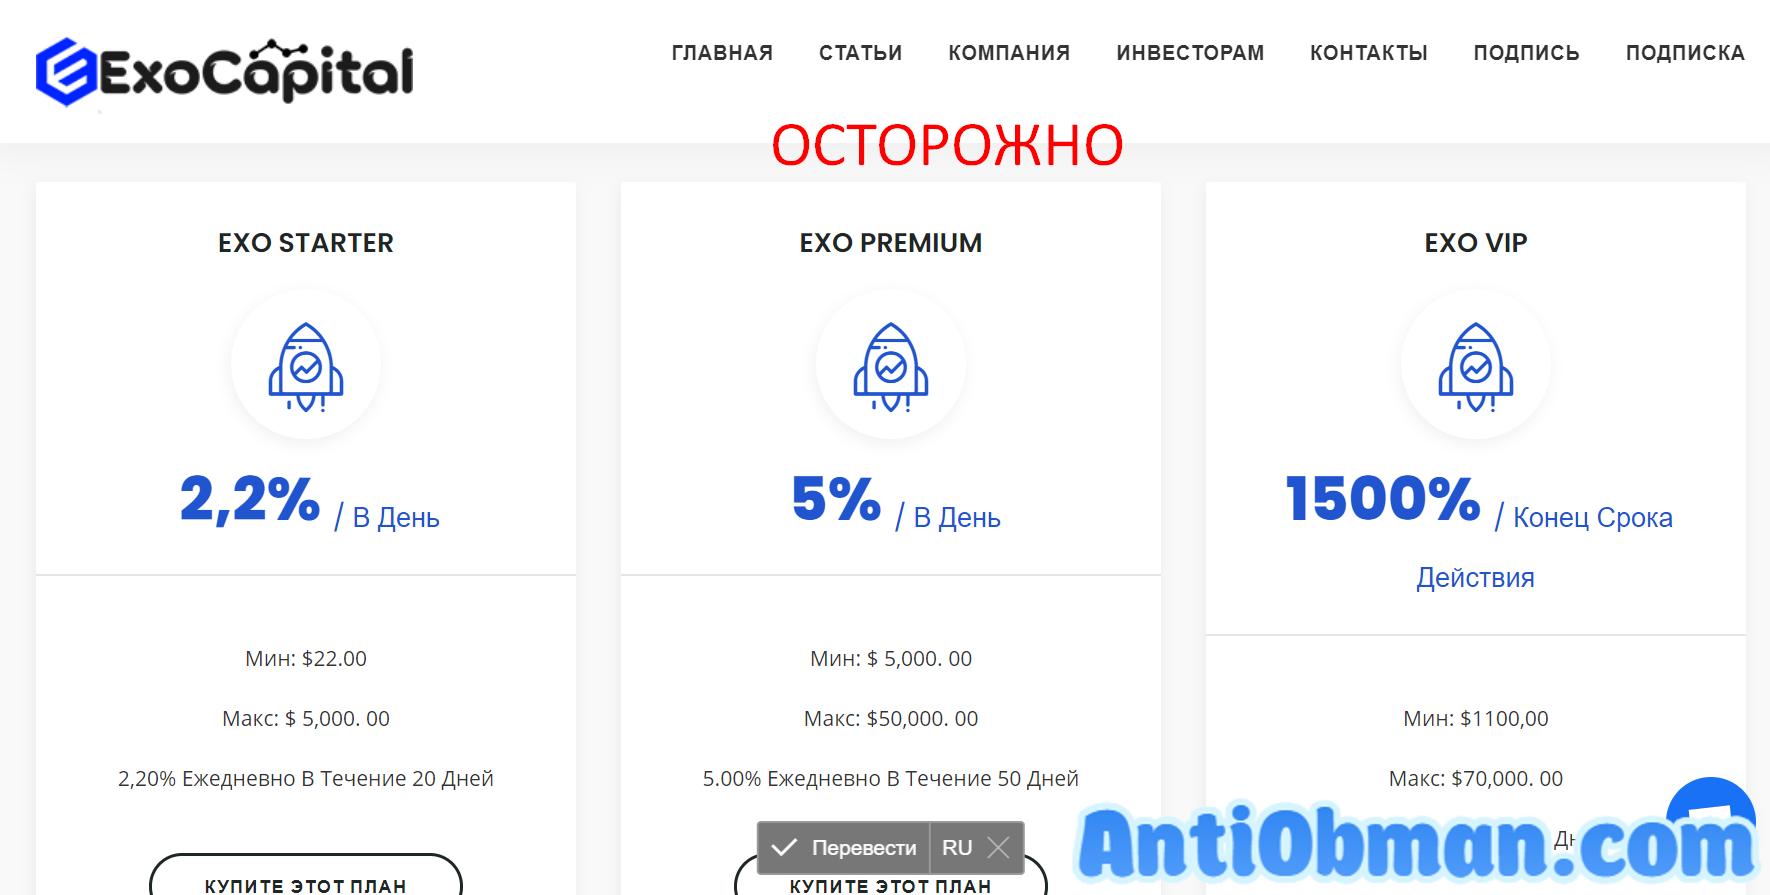 ExoCapital (exo.capital) - отзывы и обзор проекта